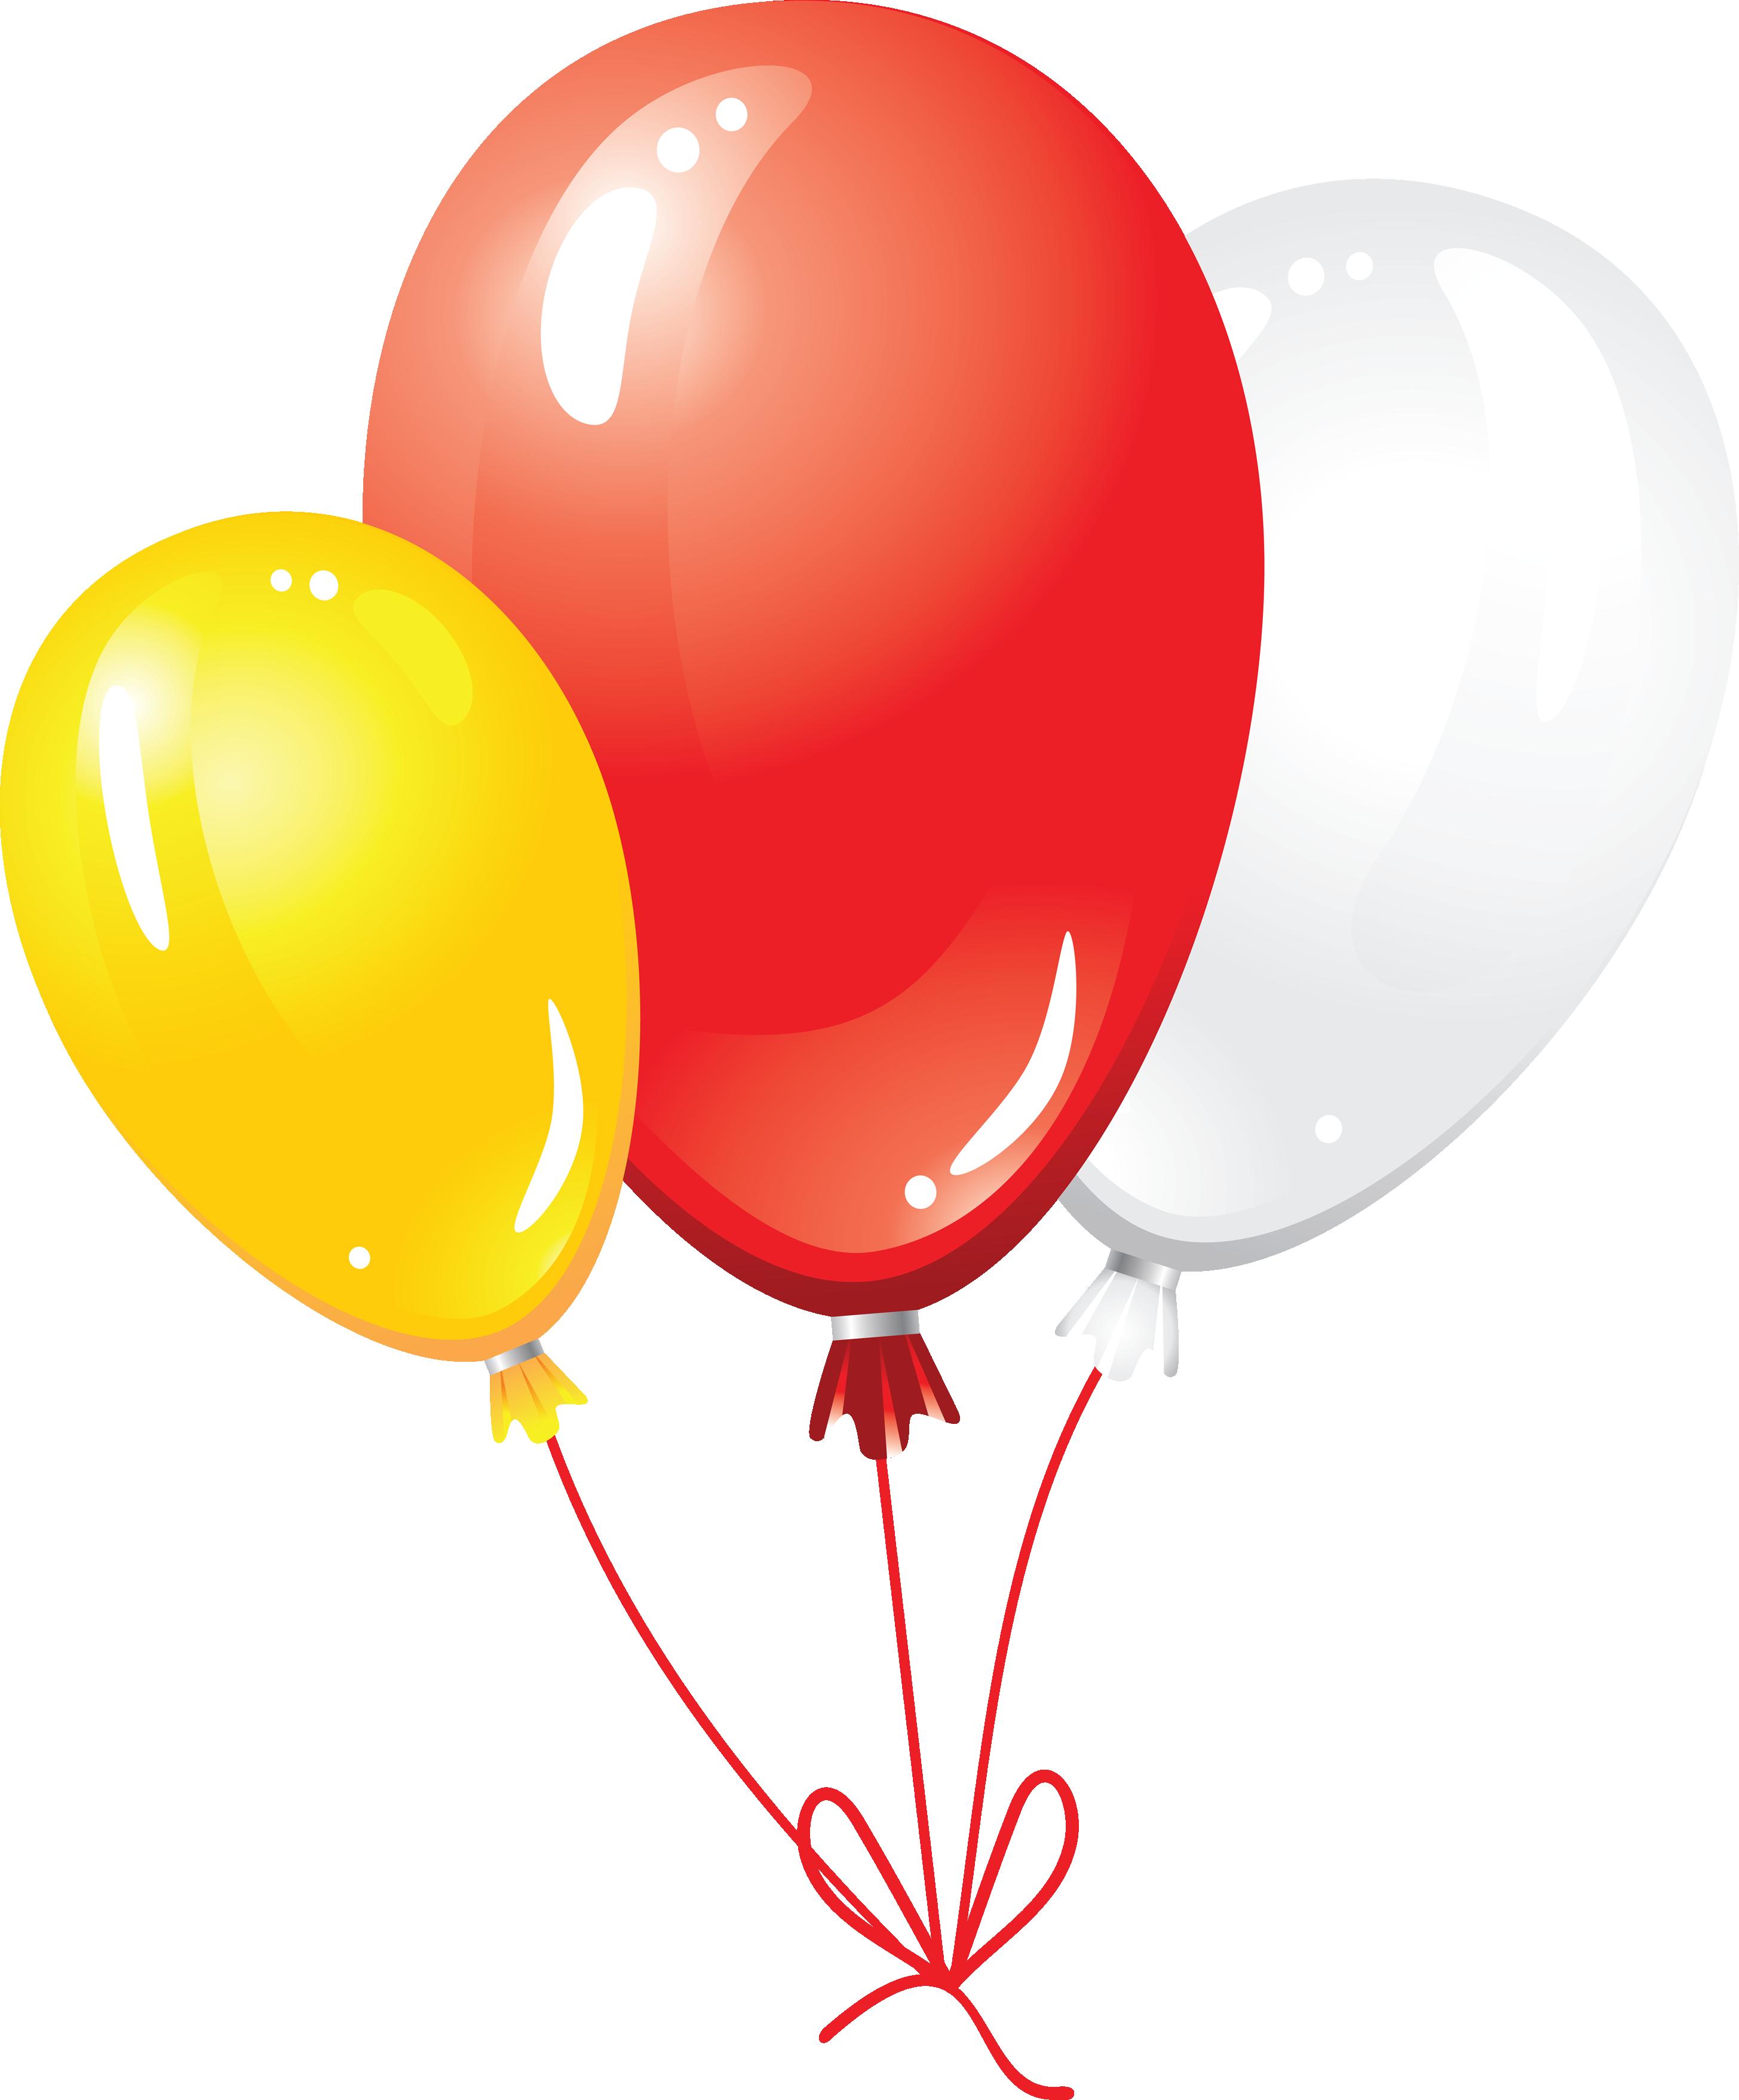 Balloon HD PNG - 91246